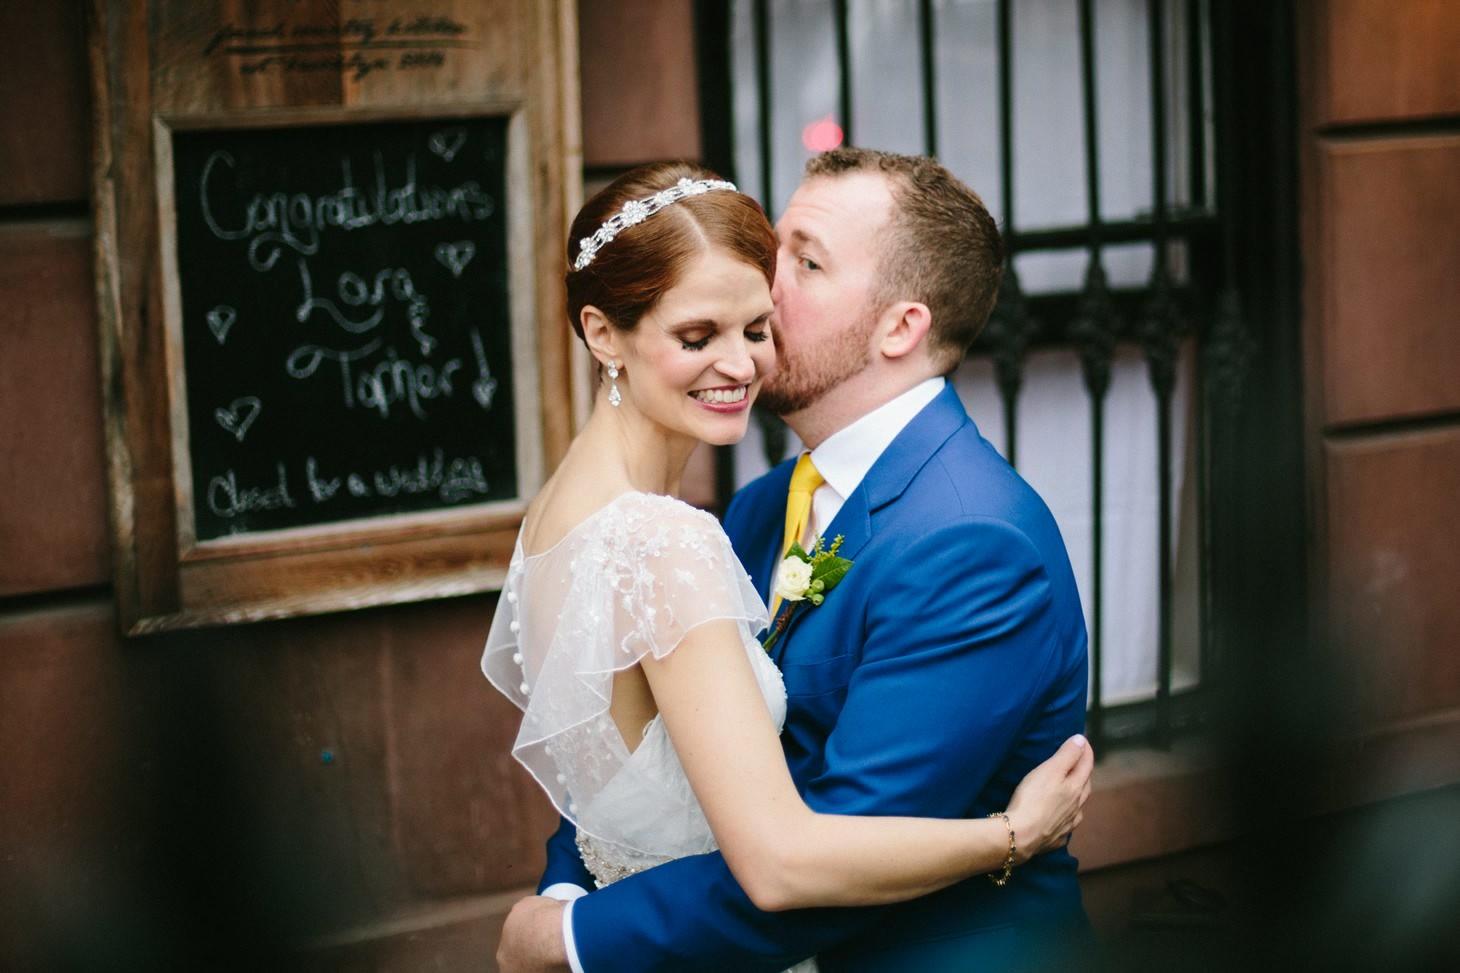 brooklyn-restaurant-wedding-nyc-weddingi-photographer-smitten-chickens23.jpg